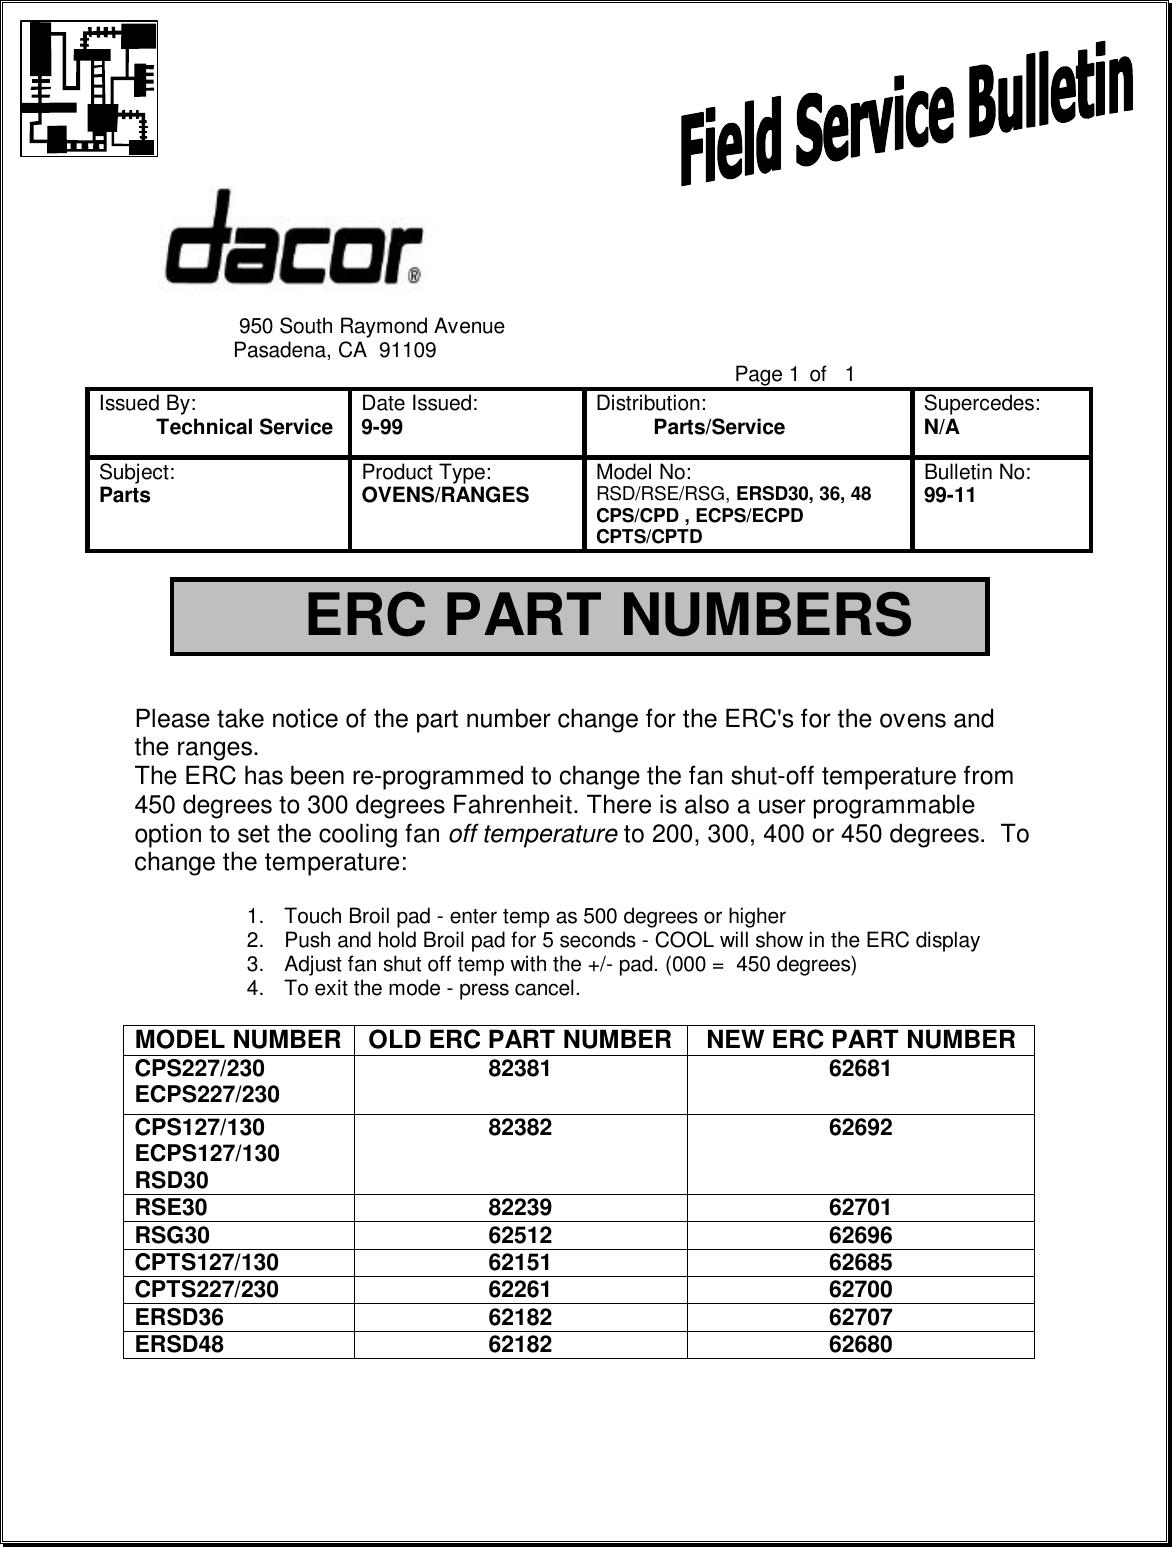 Dacor Epicure Ranges ERSD36 on